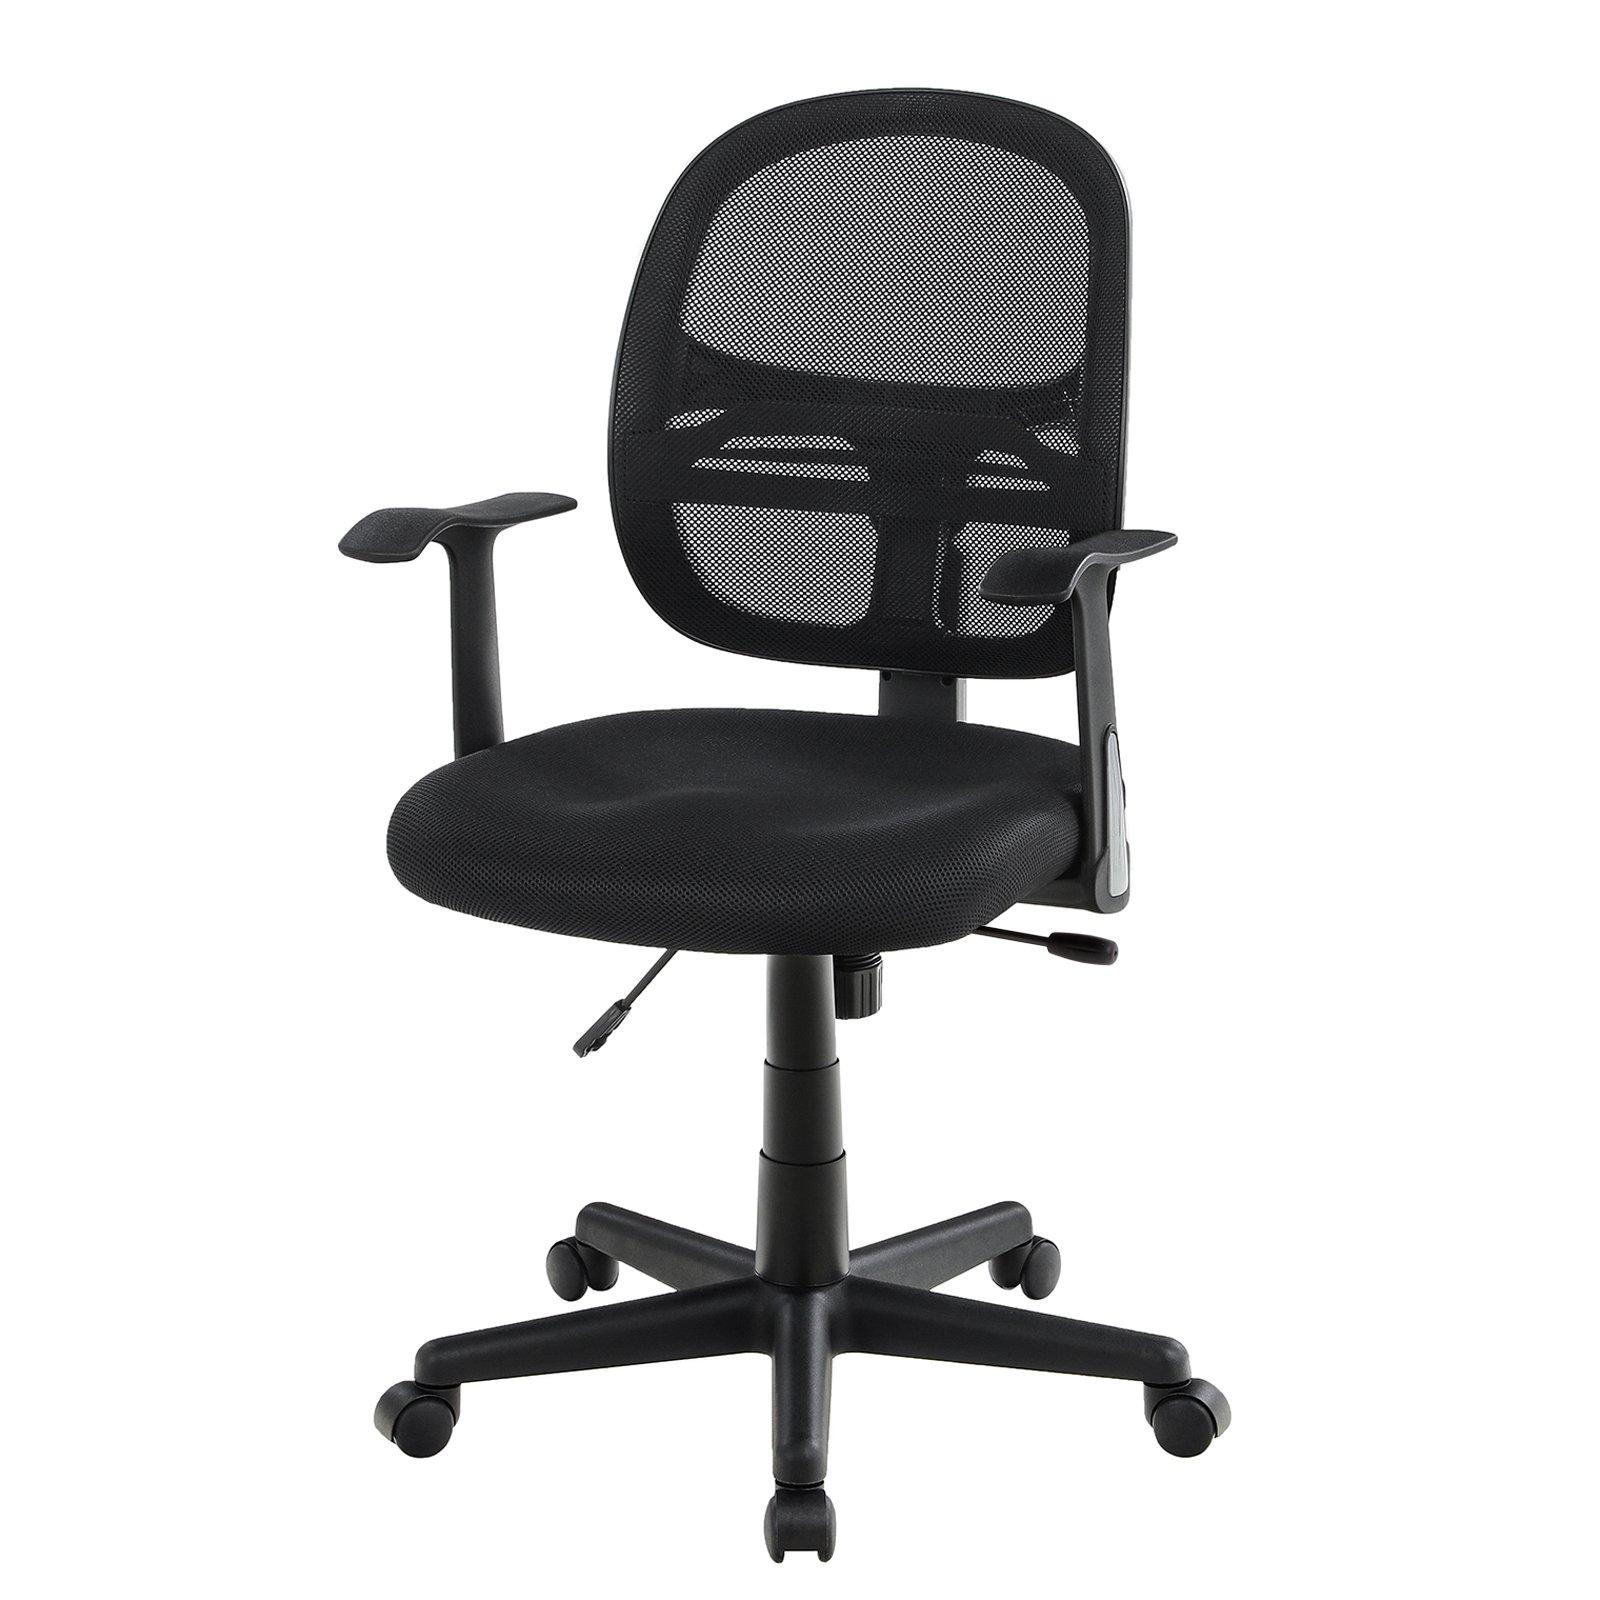 SONGMICS Ergonomic Mesh Office Chair, Computer Desk Chair, Swivel Task Chair with Armrests, Tilt Mechanism, UOBN21BK